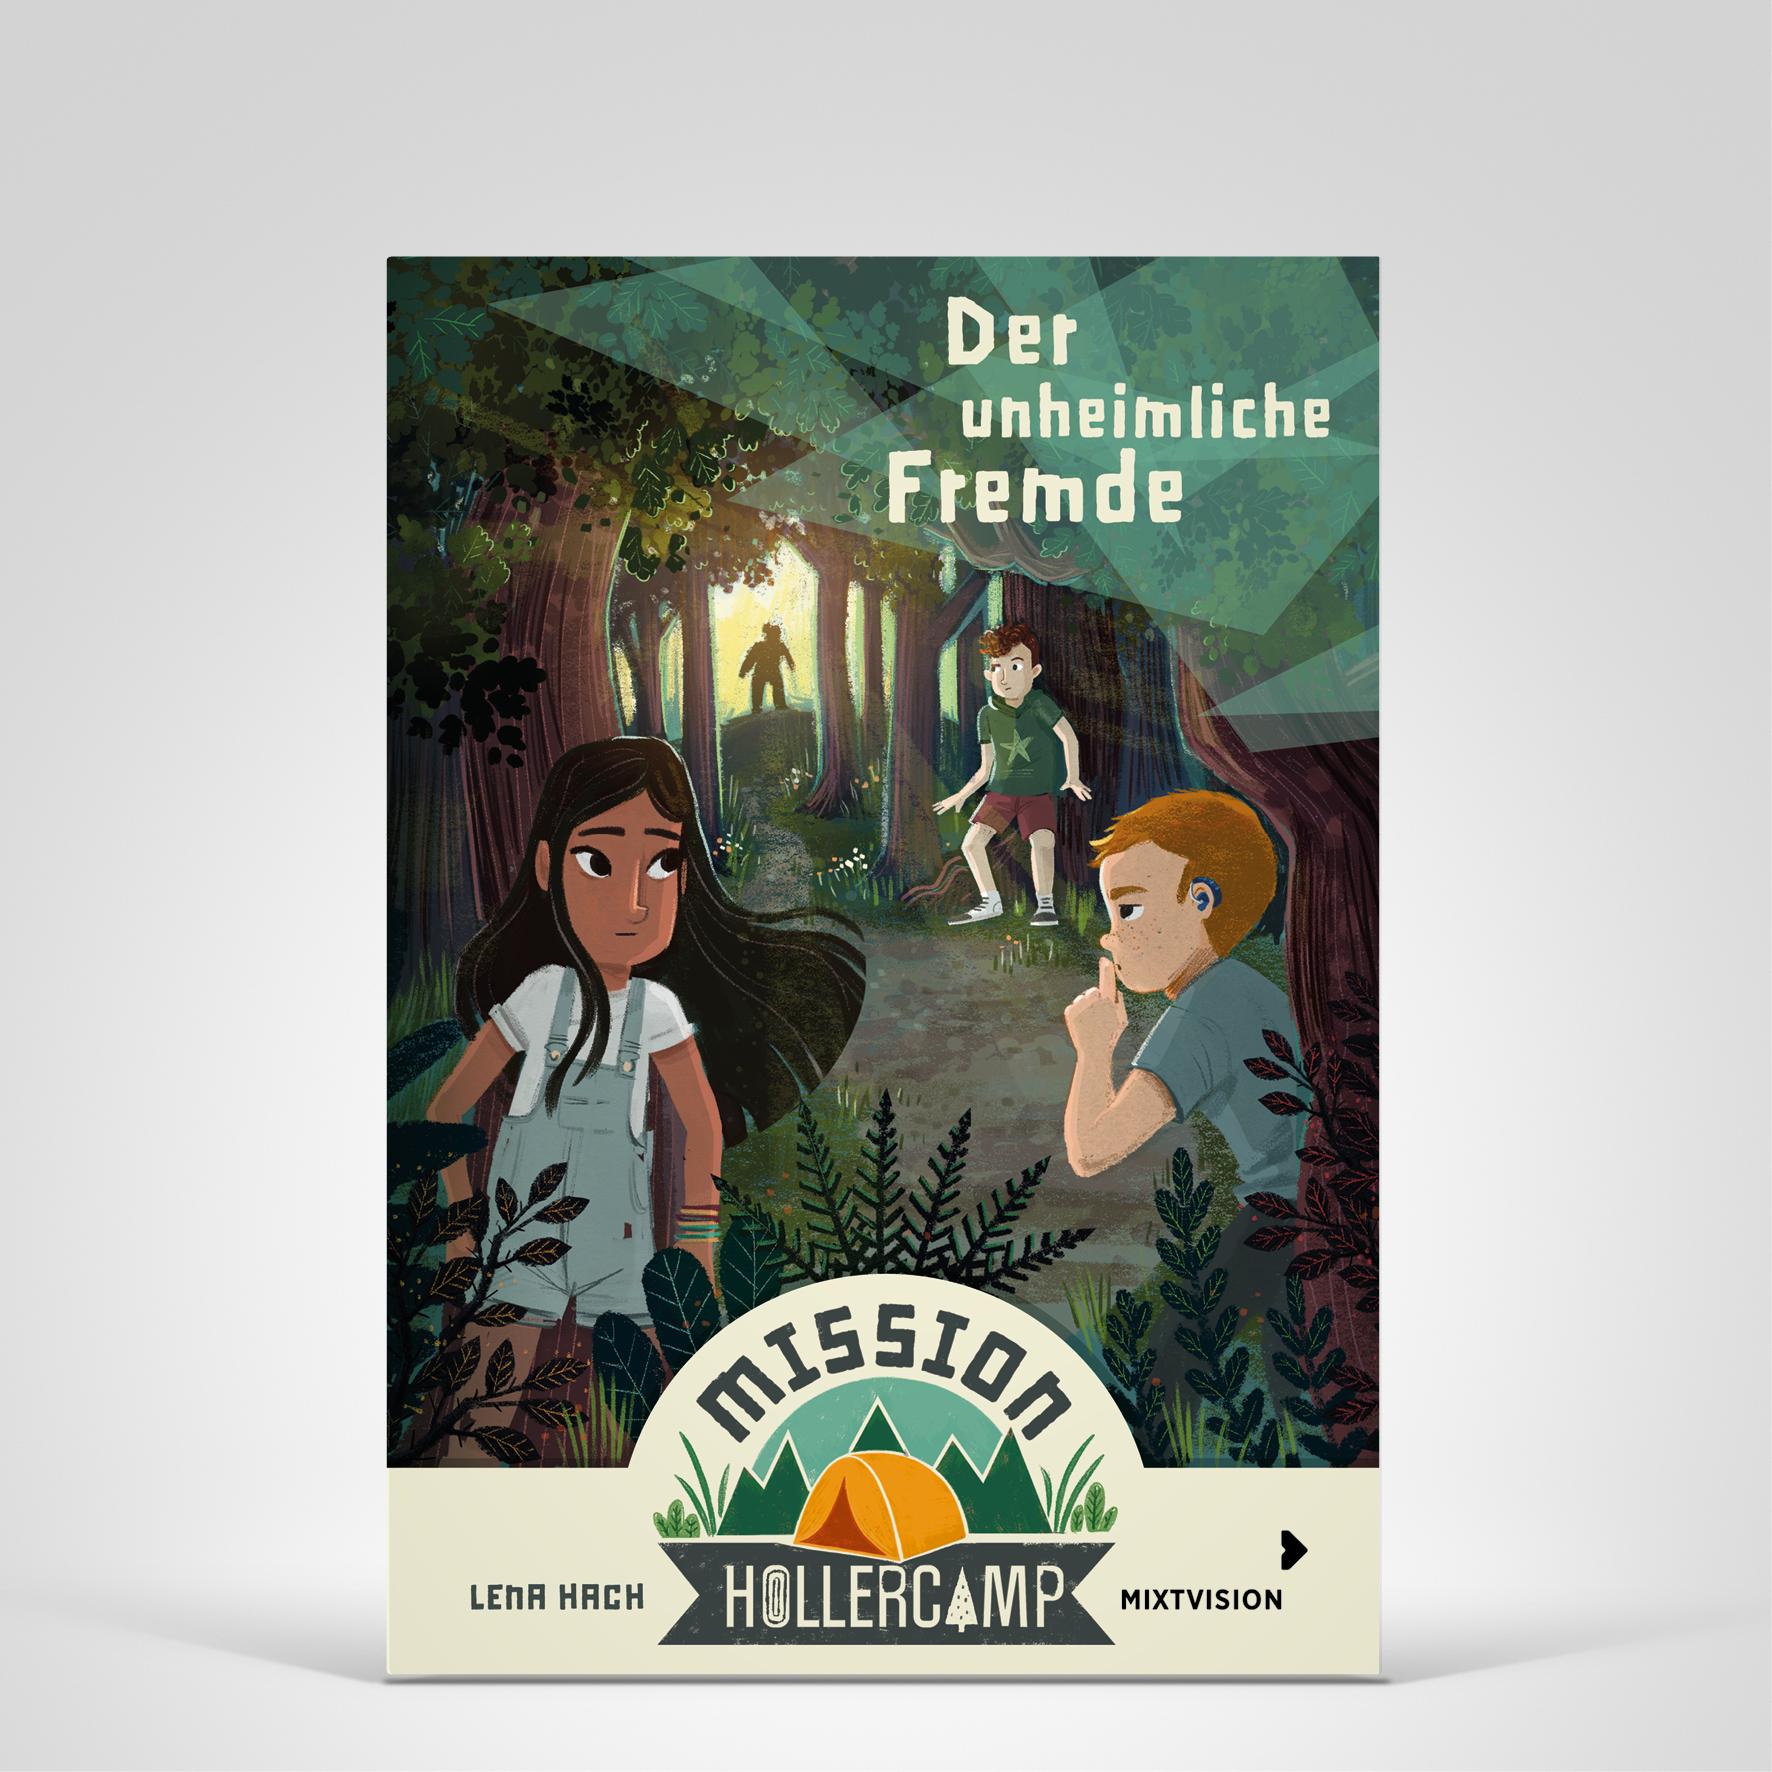 Mission Hollercamp Bd1, Cover-Abbildung